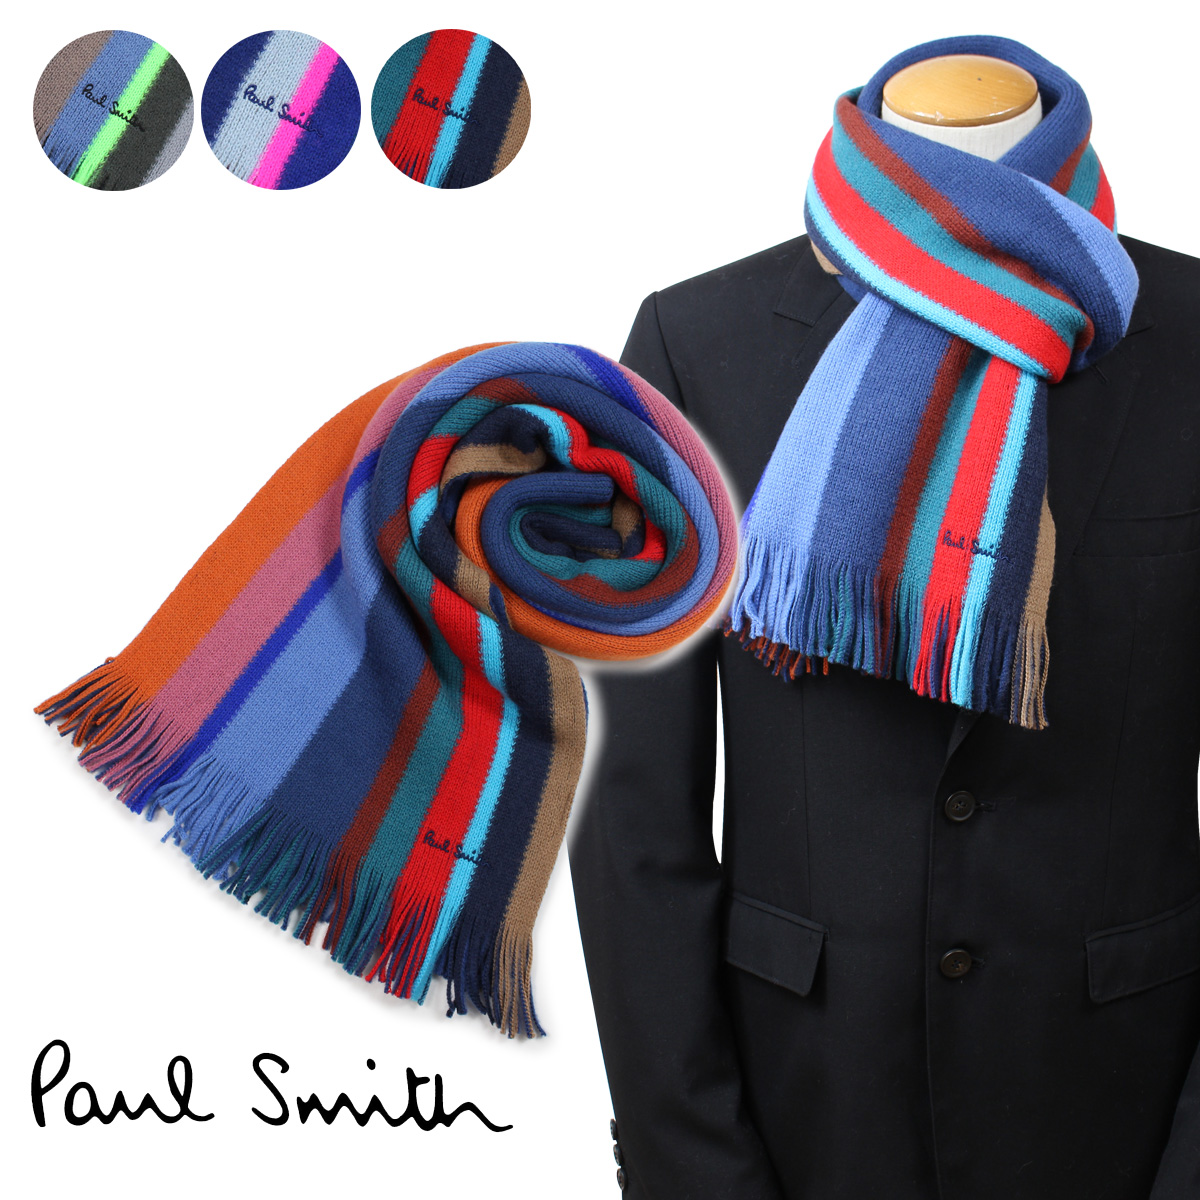 Paul Smith 355E-AS10 ポールスミス マフラー メンズ ウール マルチカラー